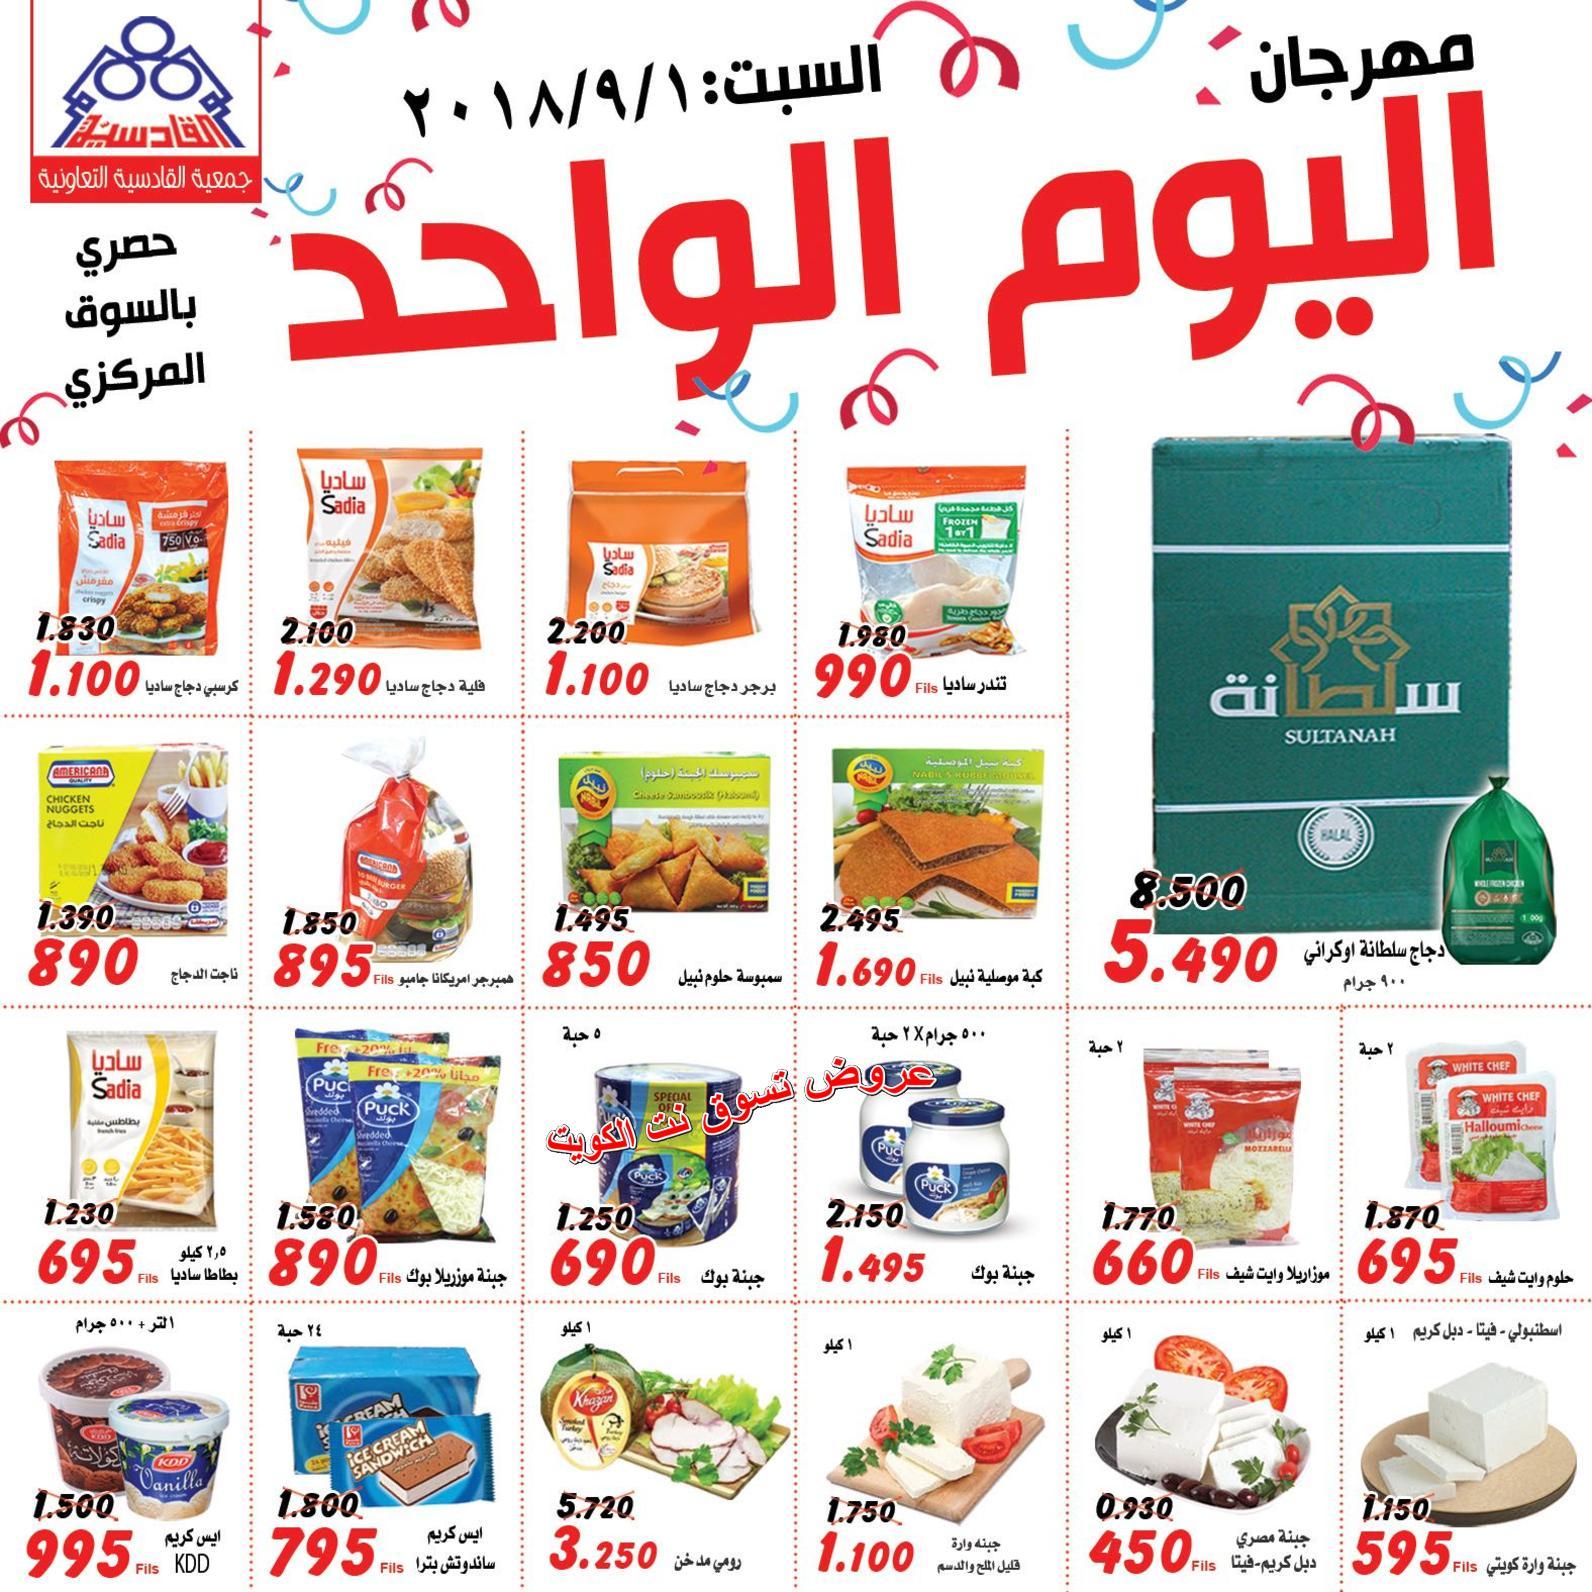 a8d8cd7d3d95f عروض جمعية القادسية التعاونية الكويت فقط السبت 1-9-2018